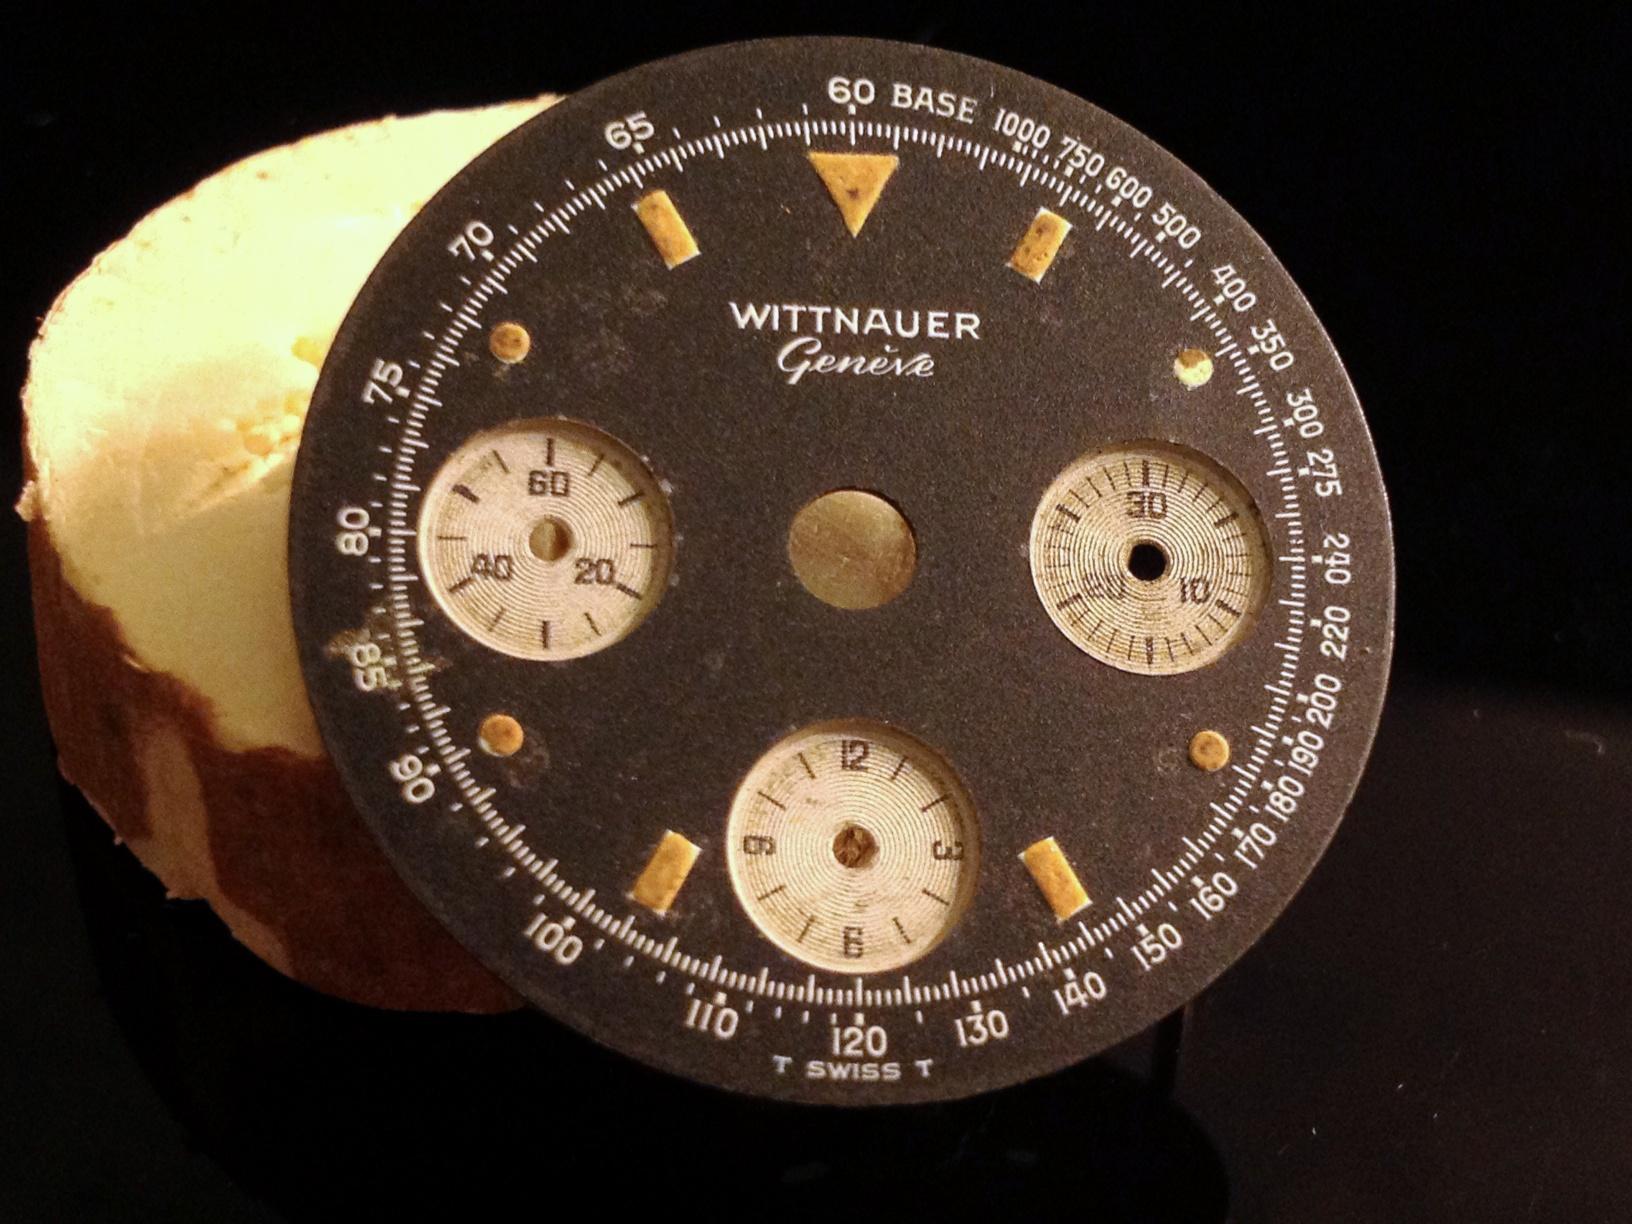 Wittnauer Valjoux 72 Black Dial 074